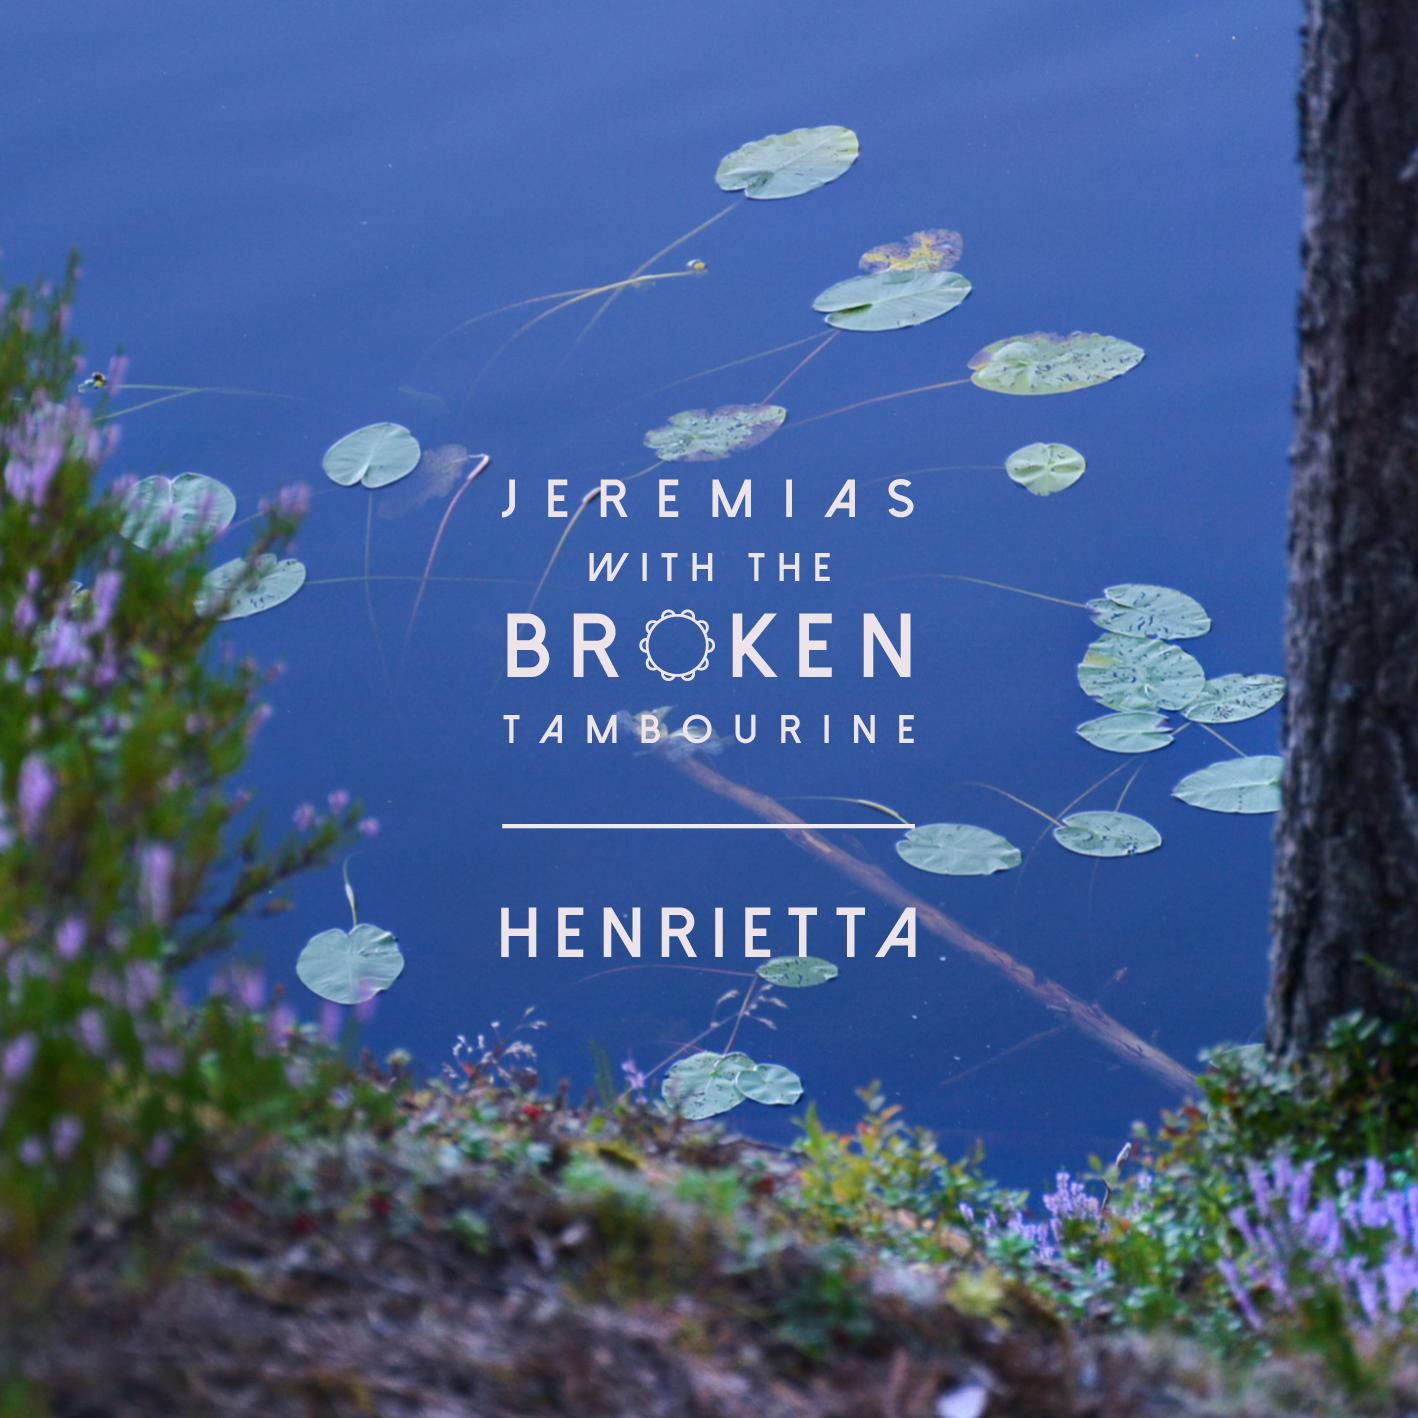 Jeremias with the broken tambourine